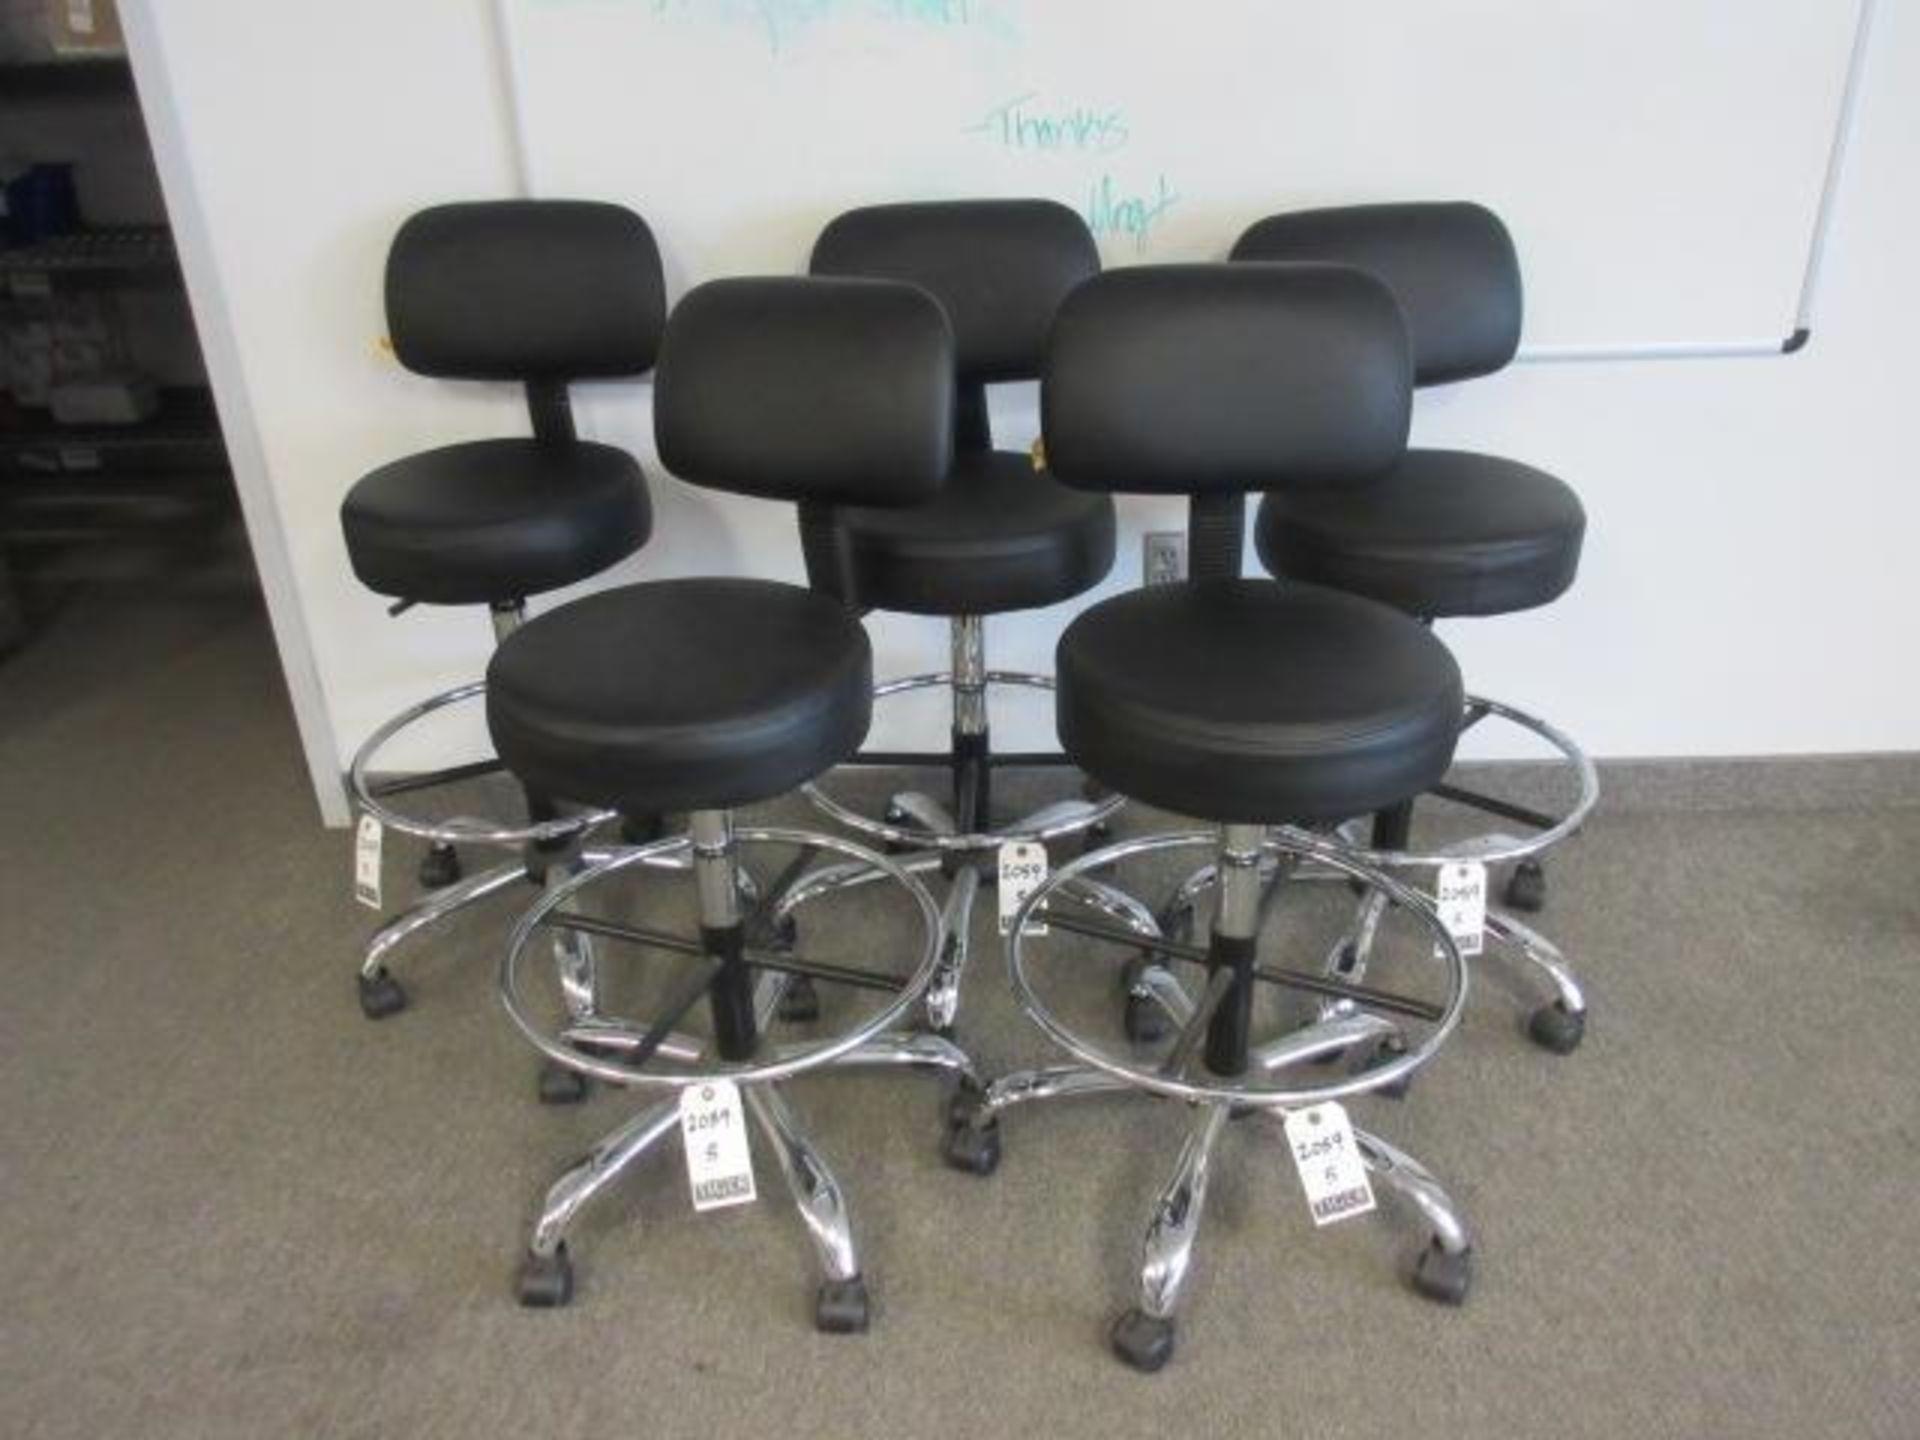 Black Lab Chairs-Swivel Base